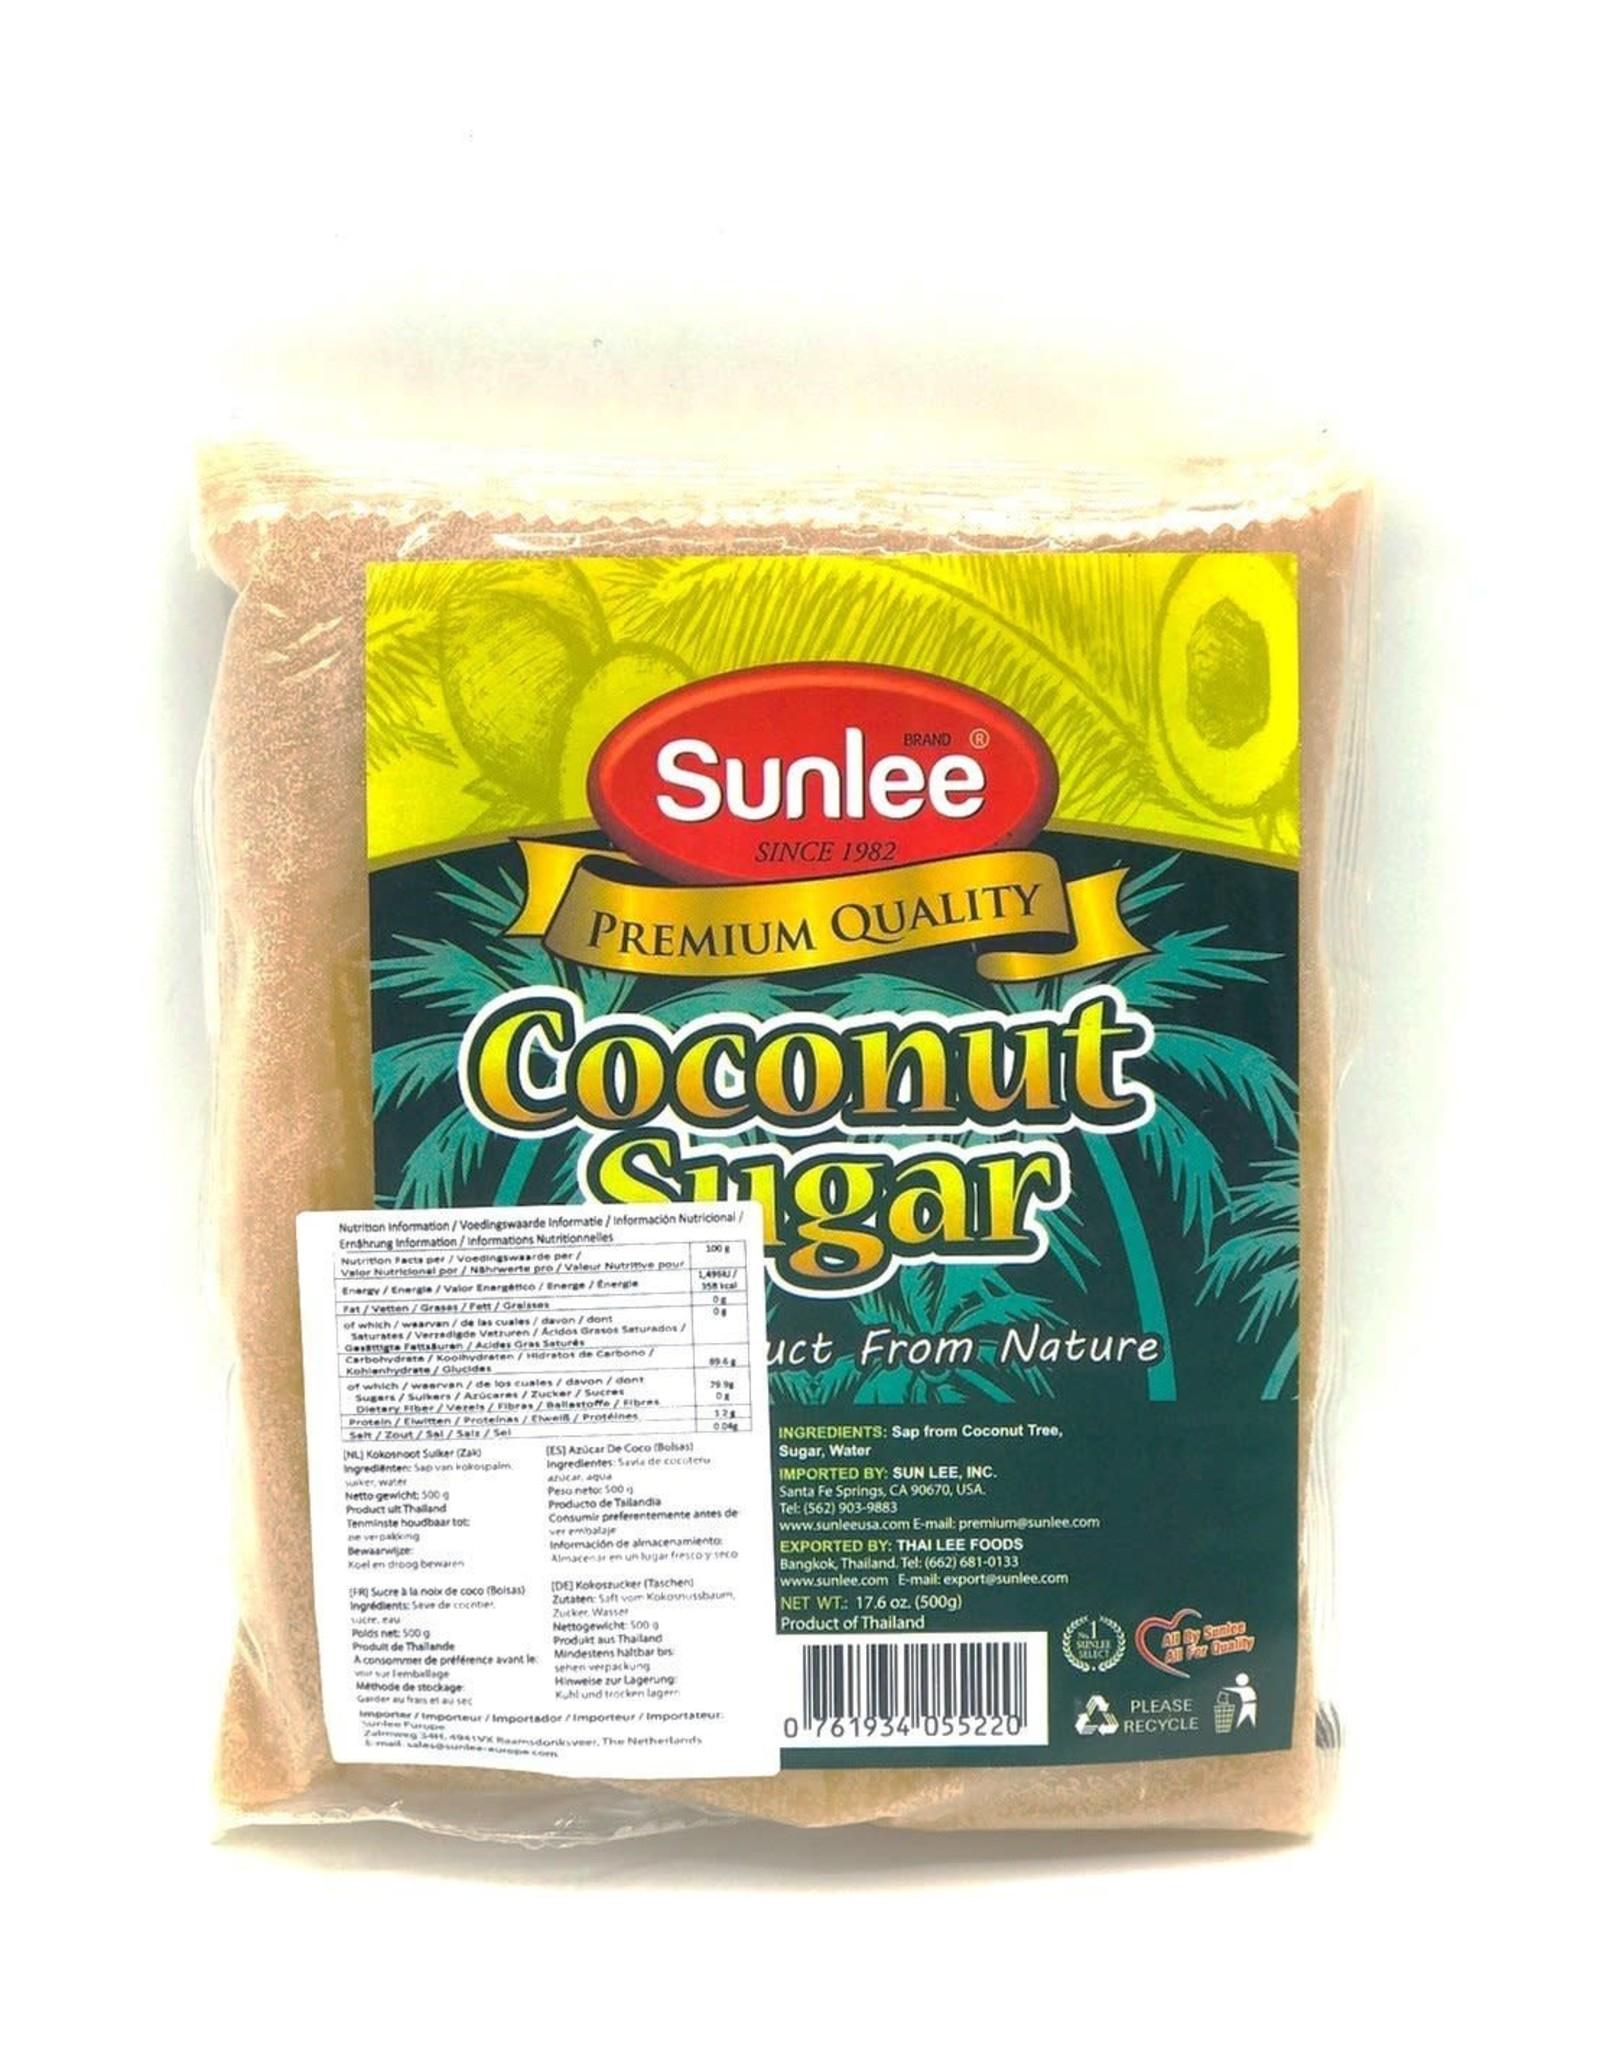 Sunlee Coconut Sugar Bag (500g)